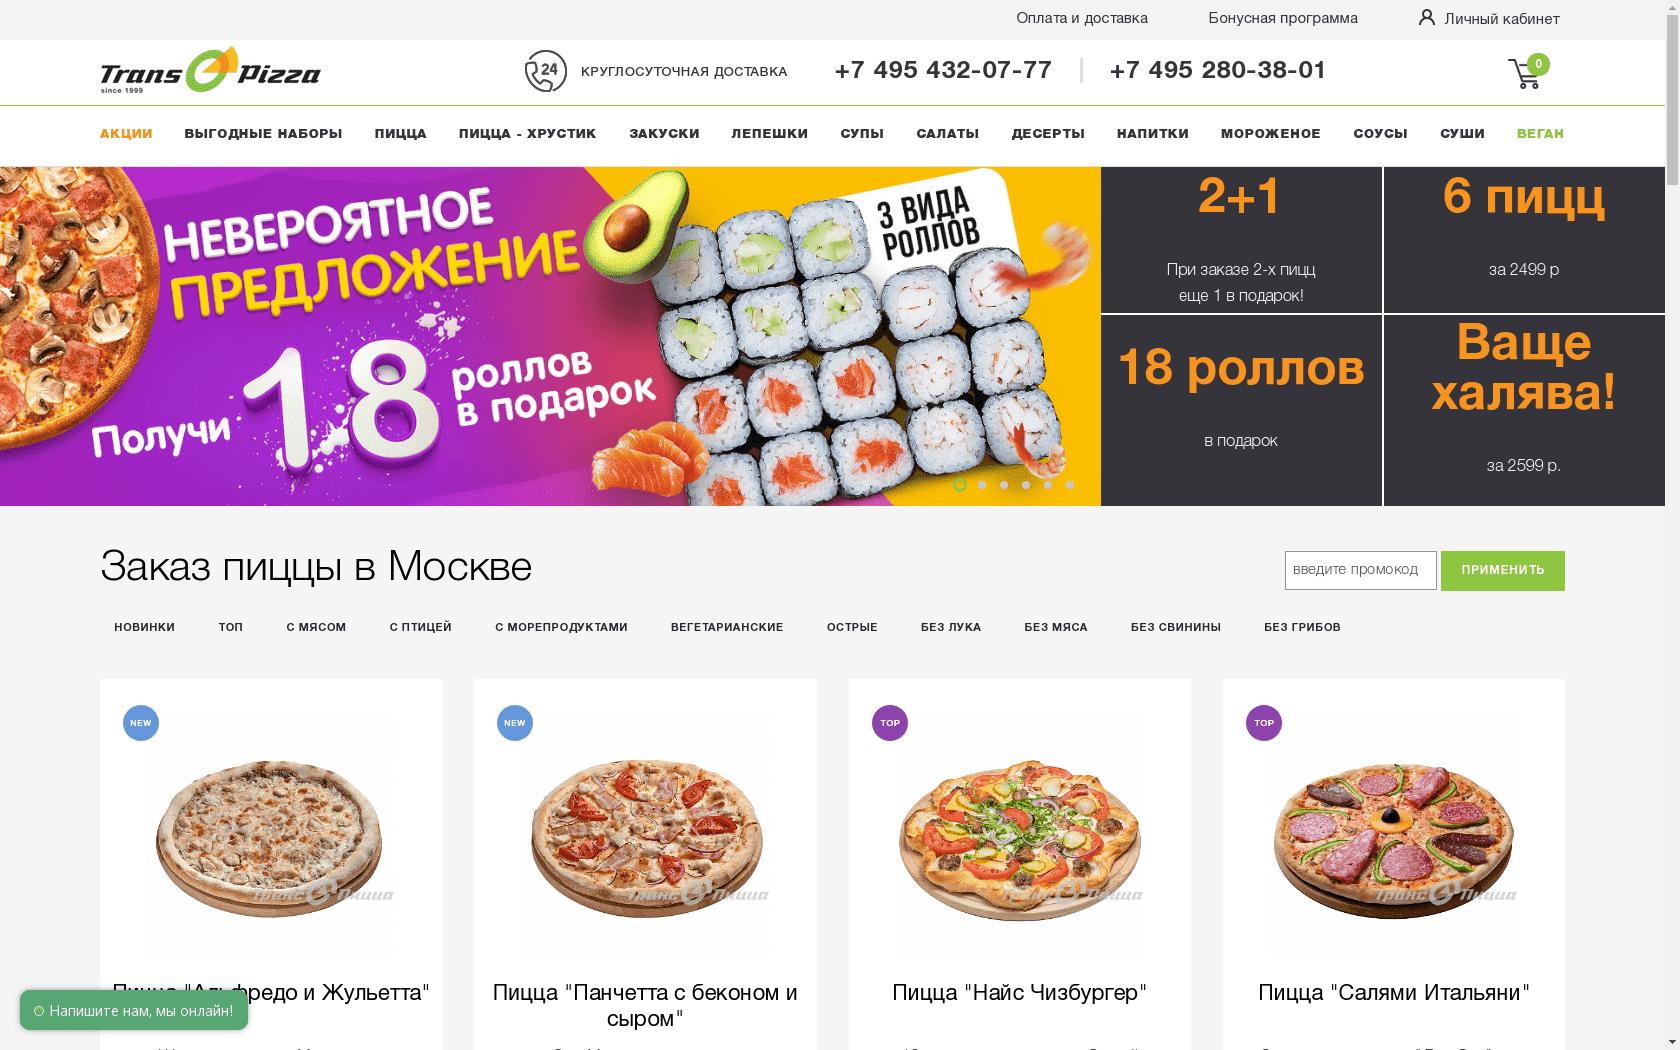 Trans Pizza